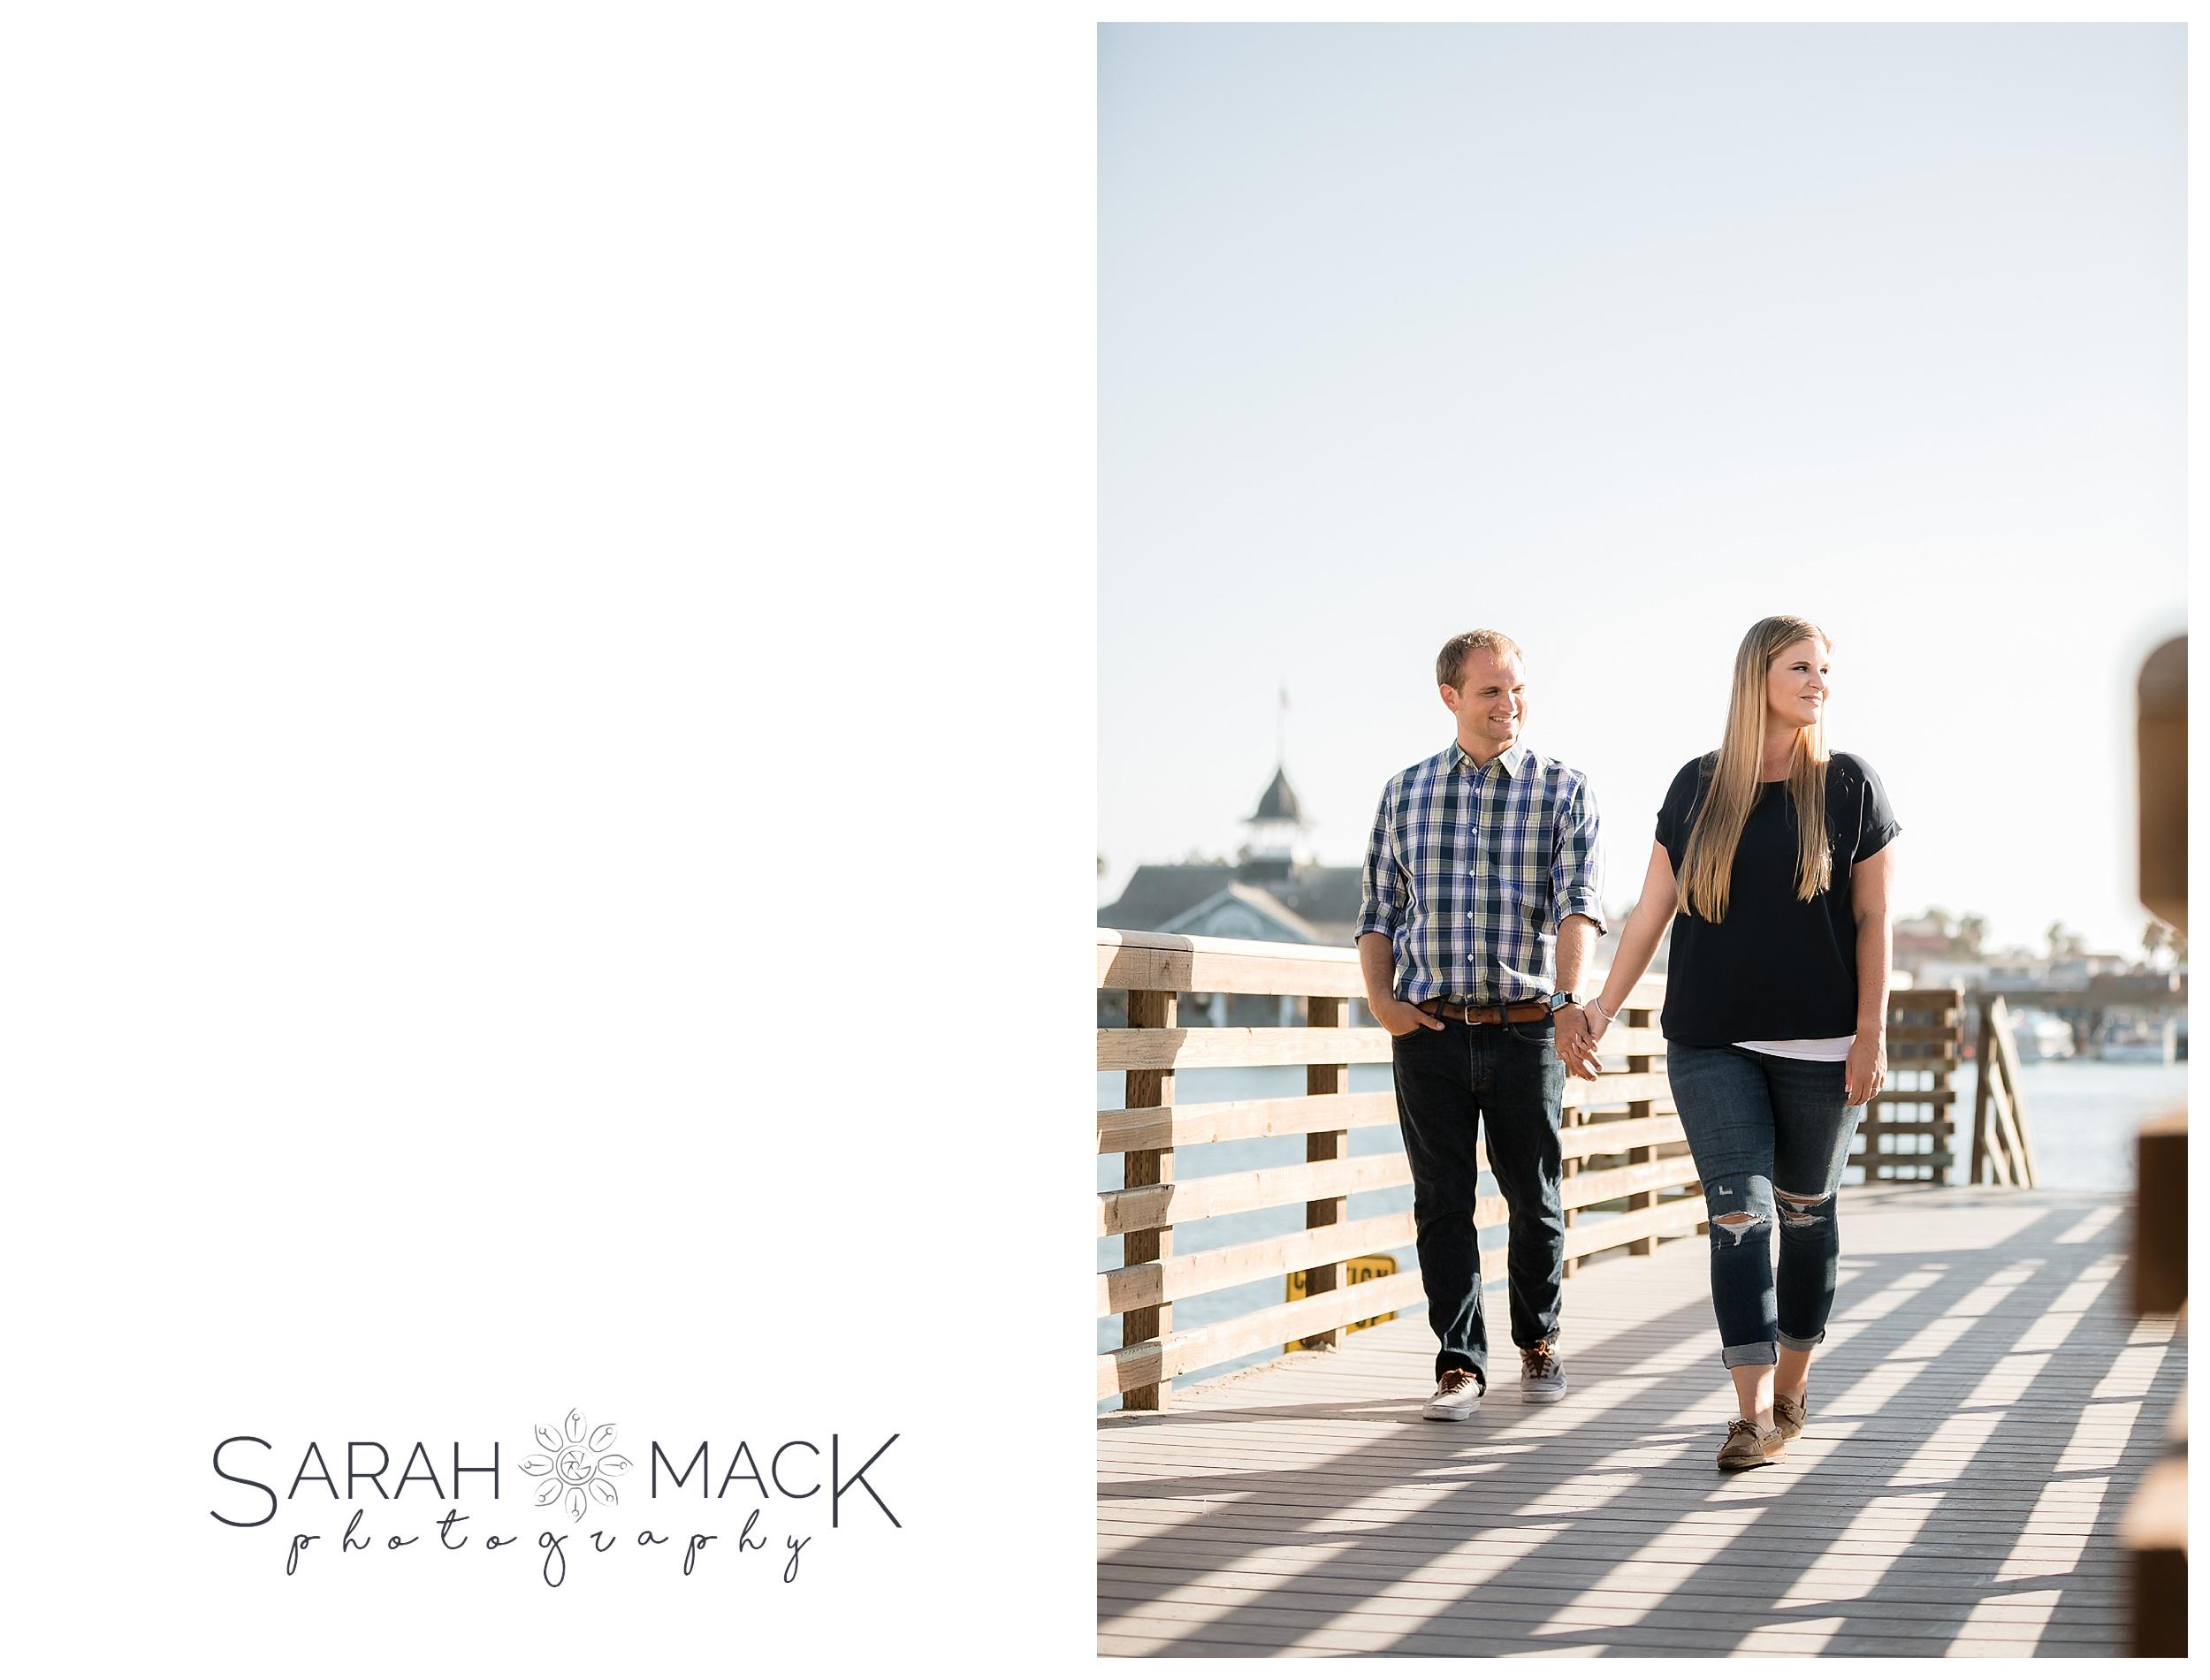 HI_Balboa_Island_Newport-Beach-Engagement-Photography-001.jpg